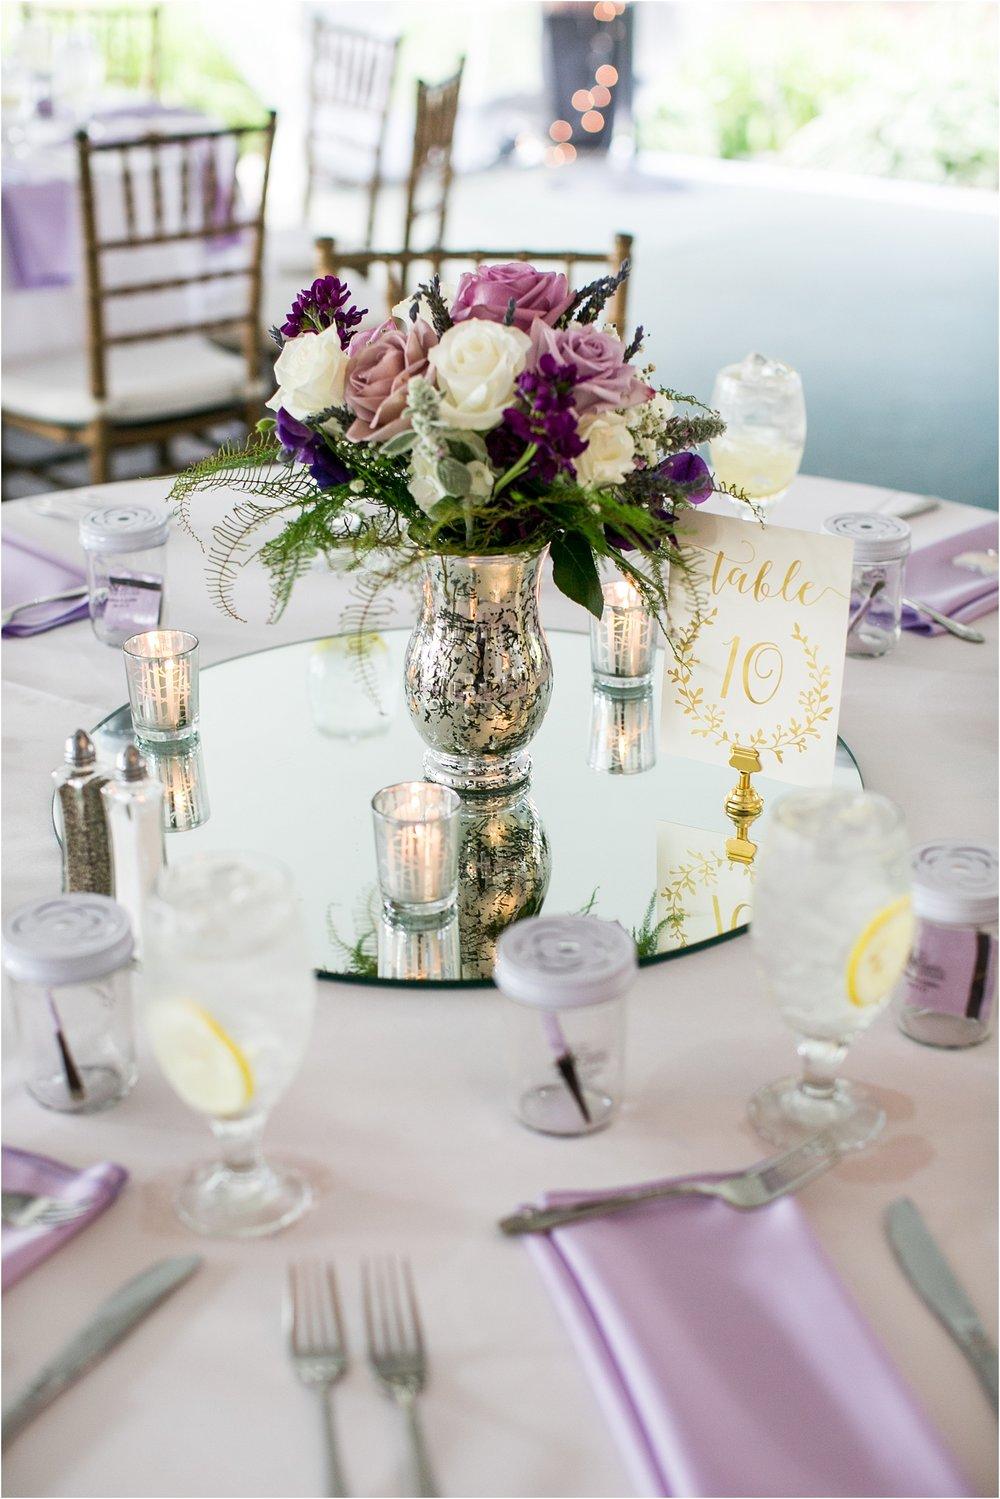 Lumley Stone Manor Wedding Living Radiant Photography photos_0180.jpg